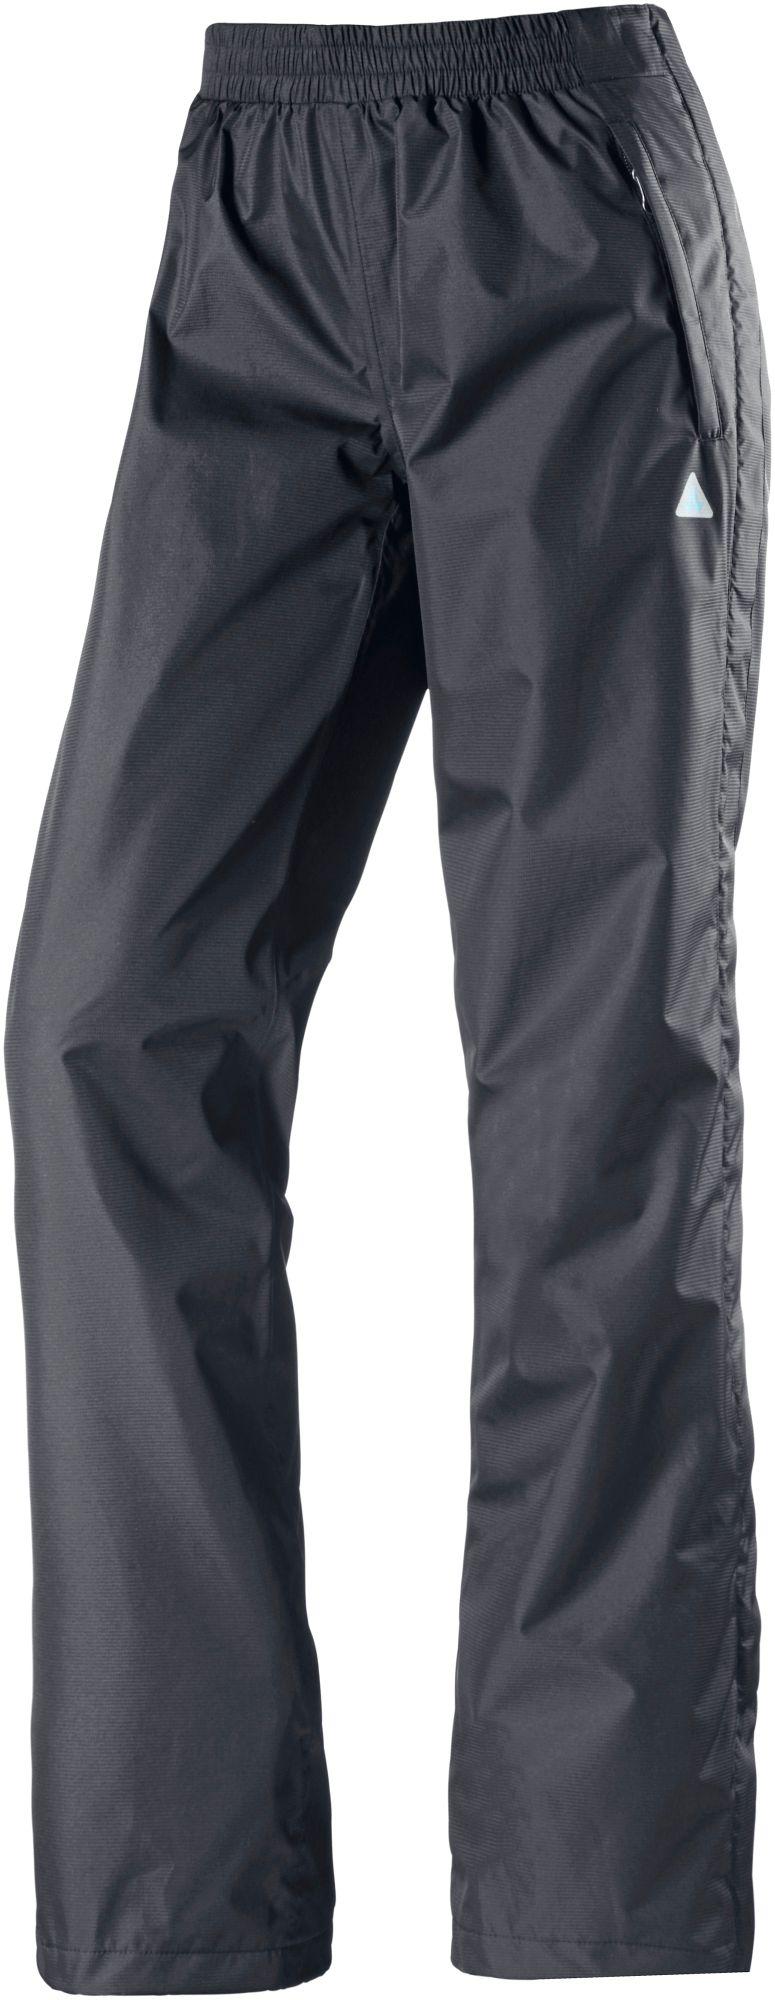 Regenhose Damen in schwarz, Größe 42